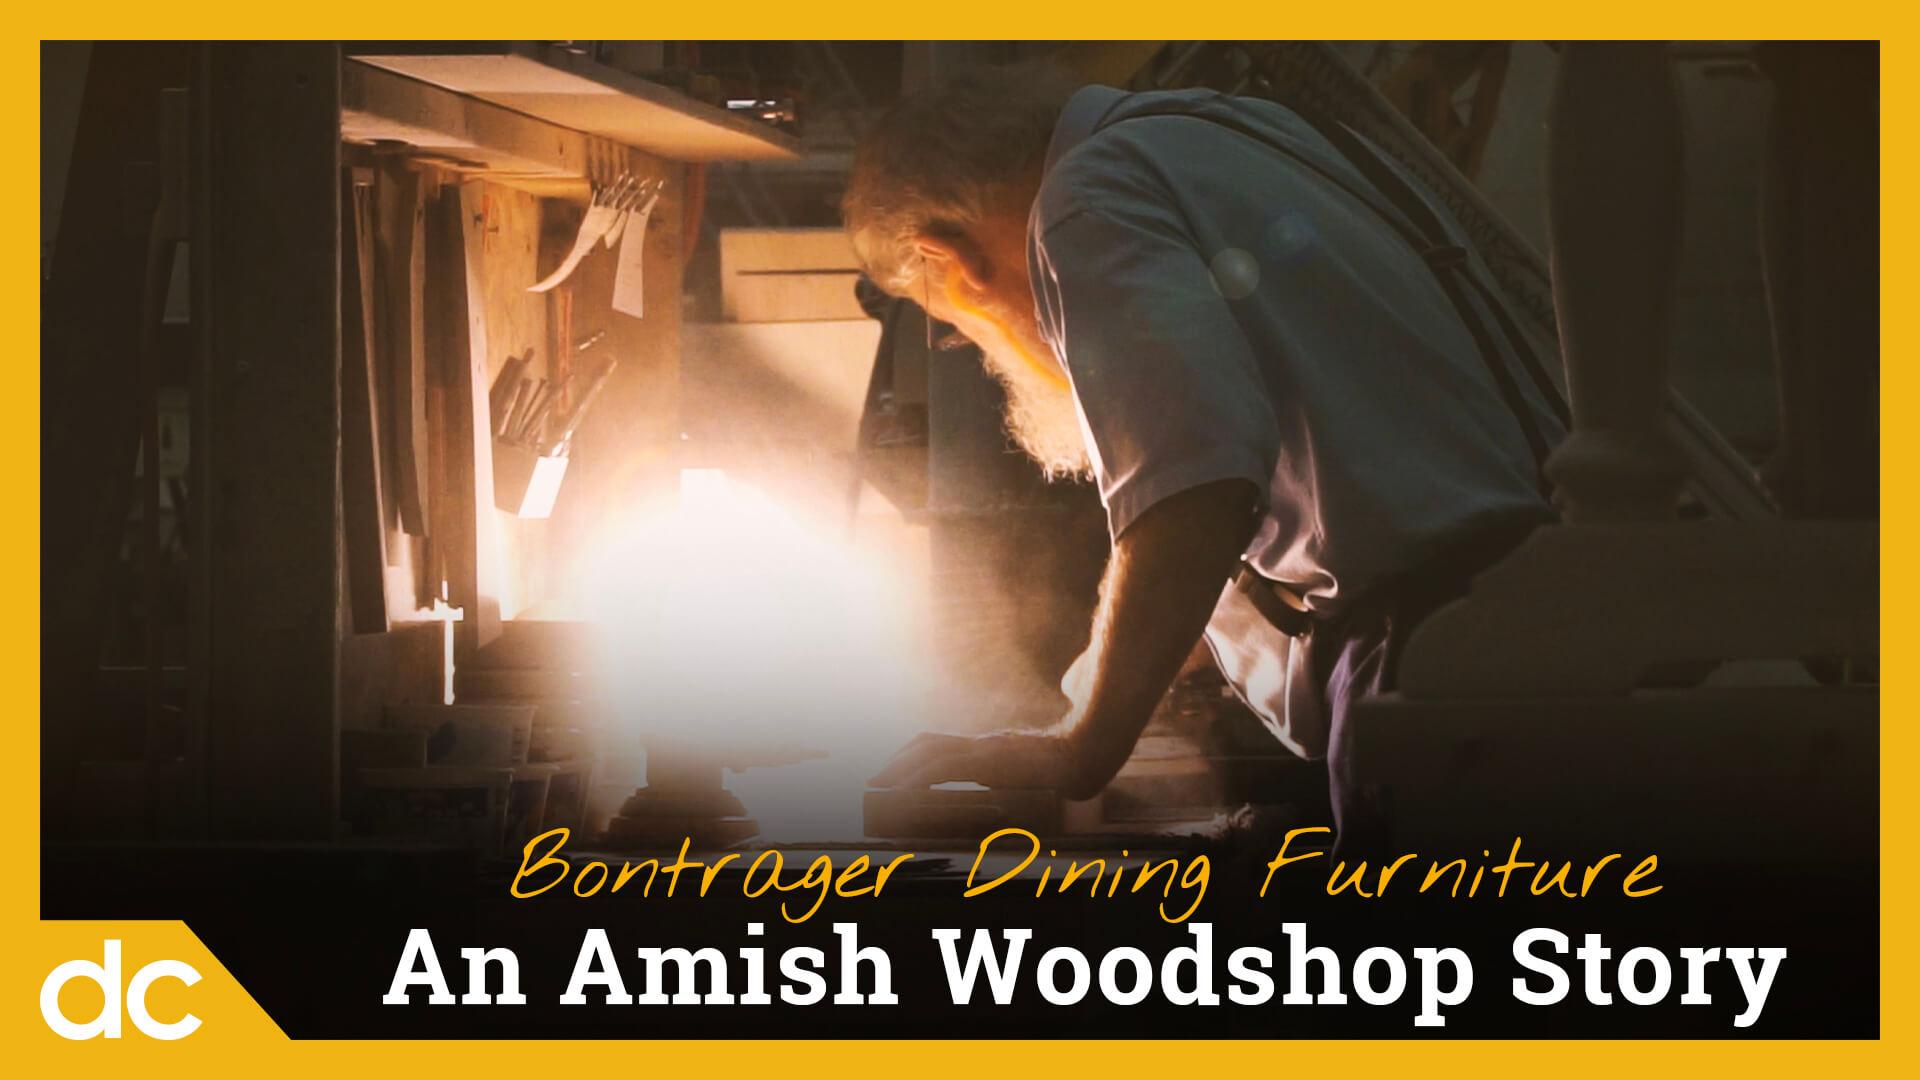 Bontrager Dining Furniture: An Amish Woodshop Story Title Image